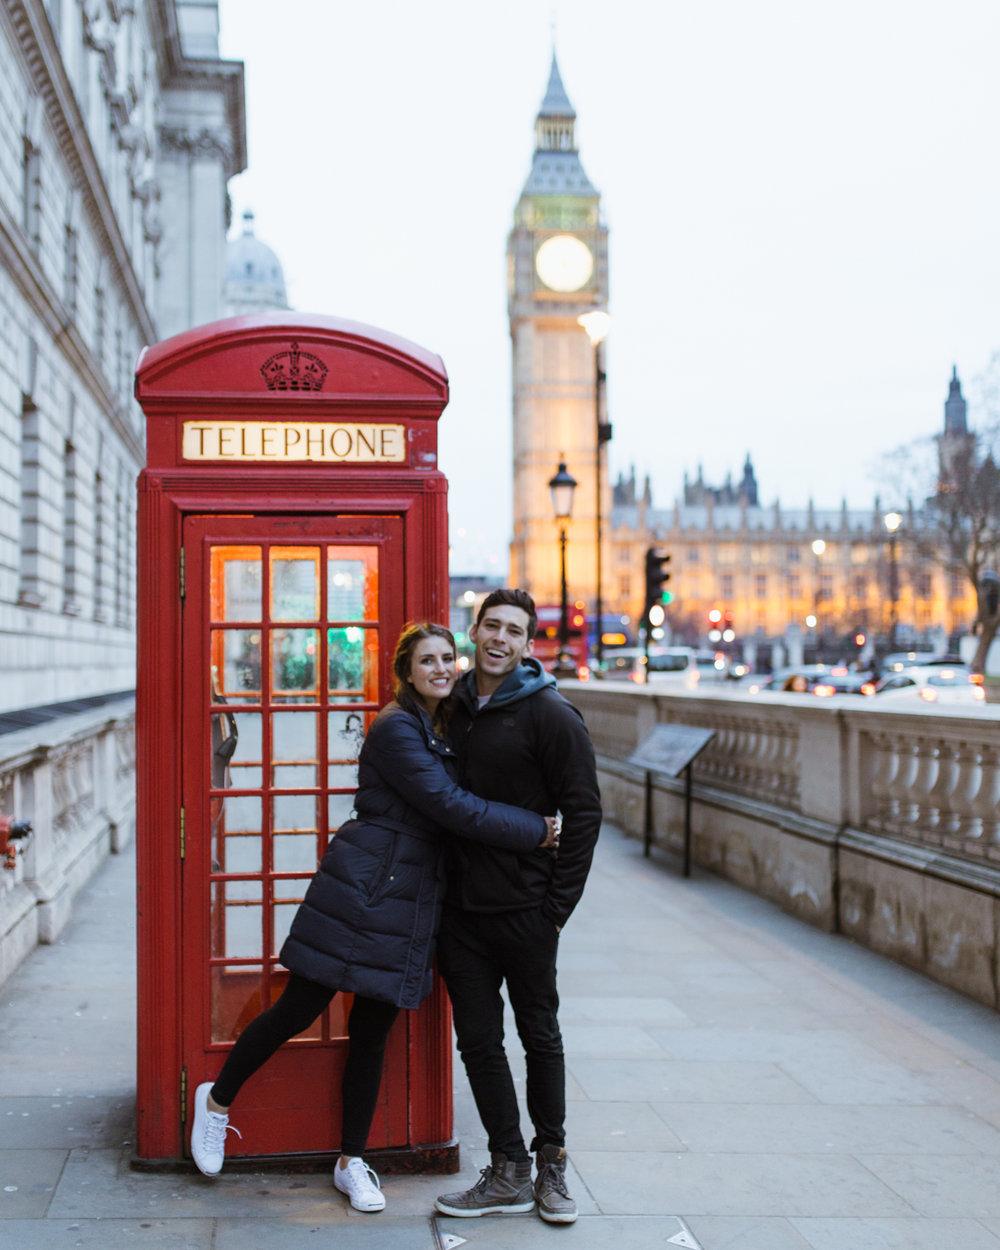 londontelephonebooth